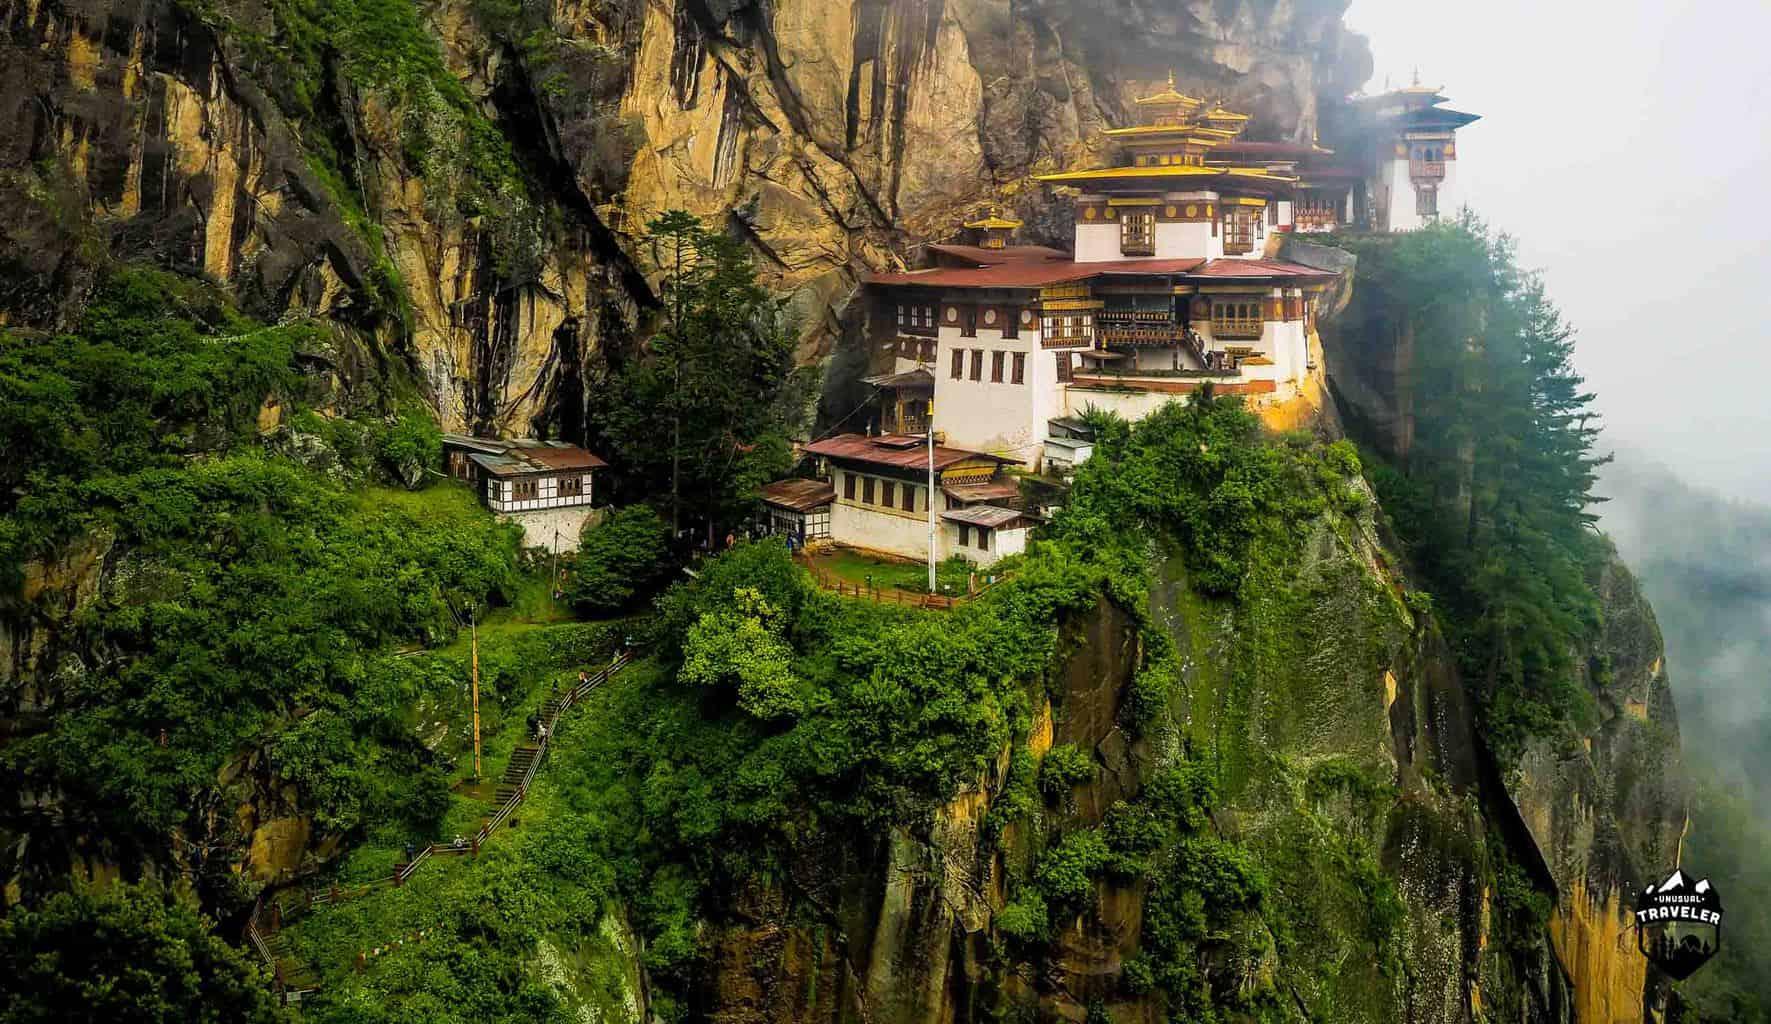 The Niger nest Monastery in Bhutan travel guide